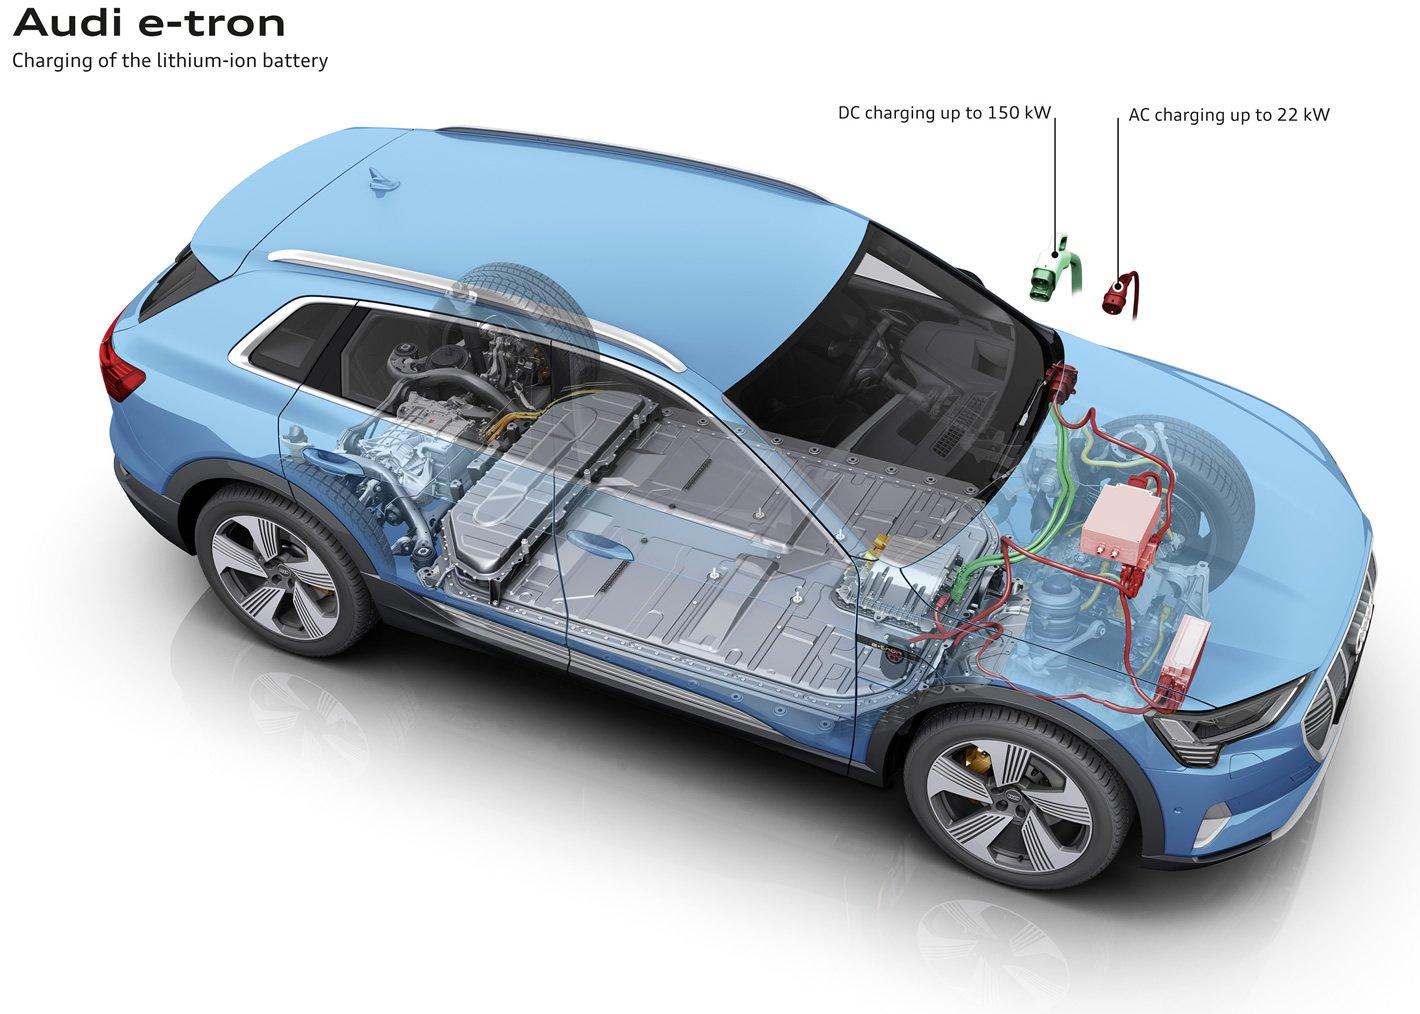 Audi e-tron baterie i ładowanie